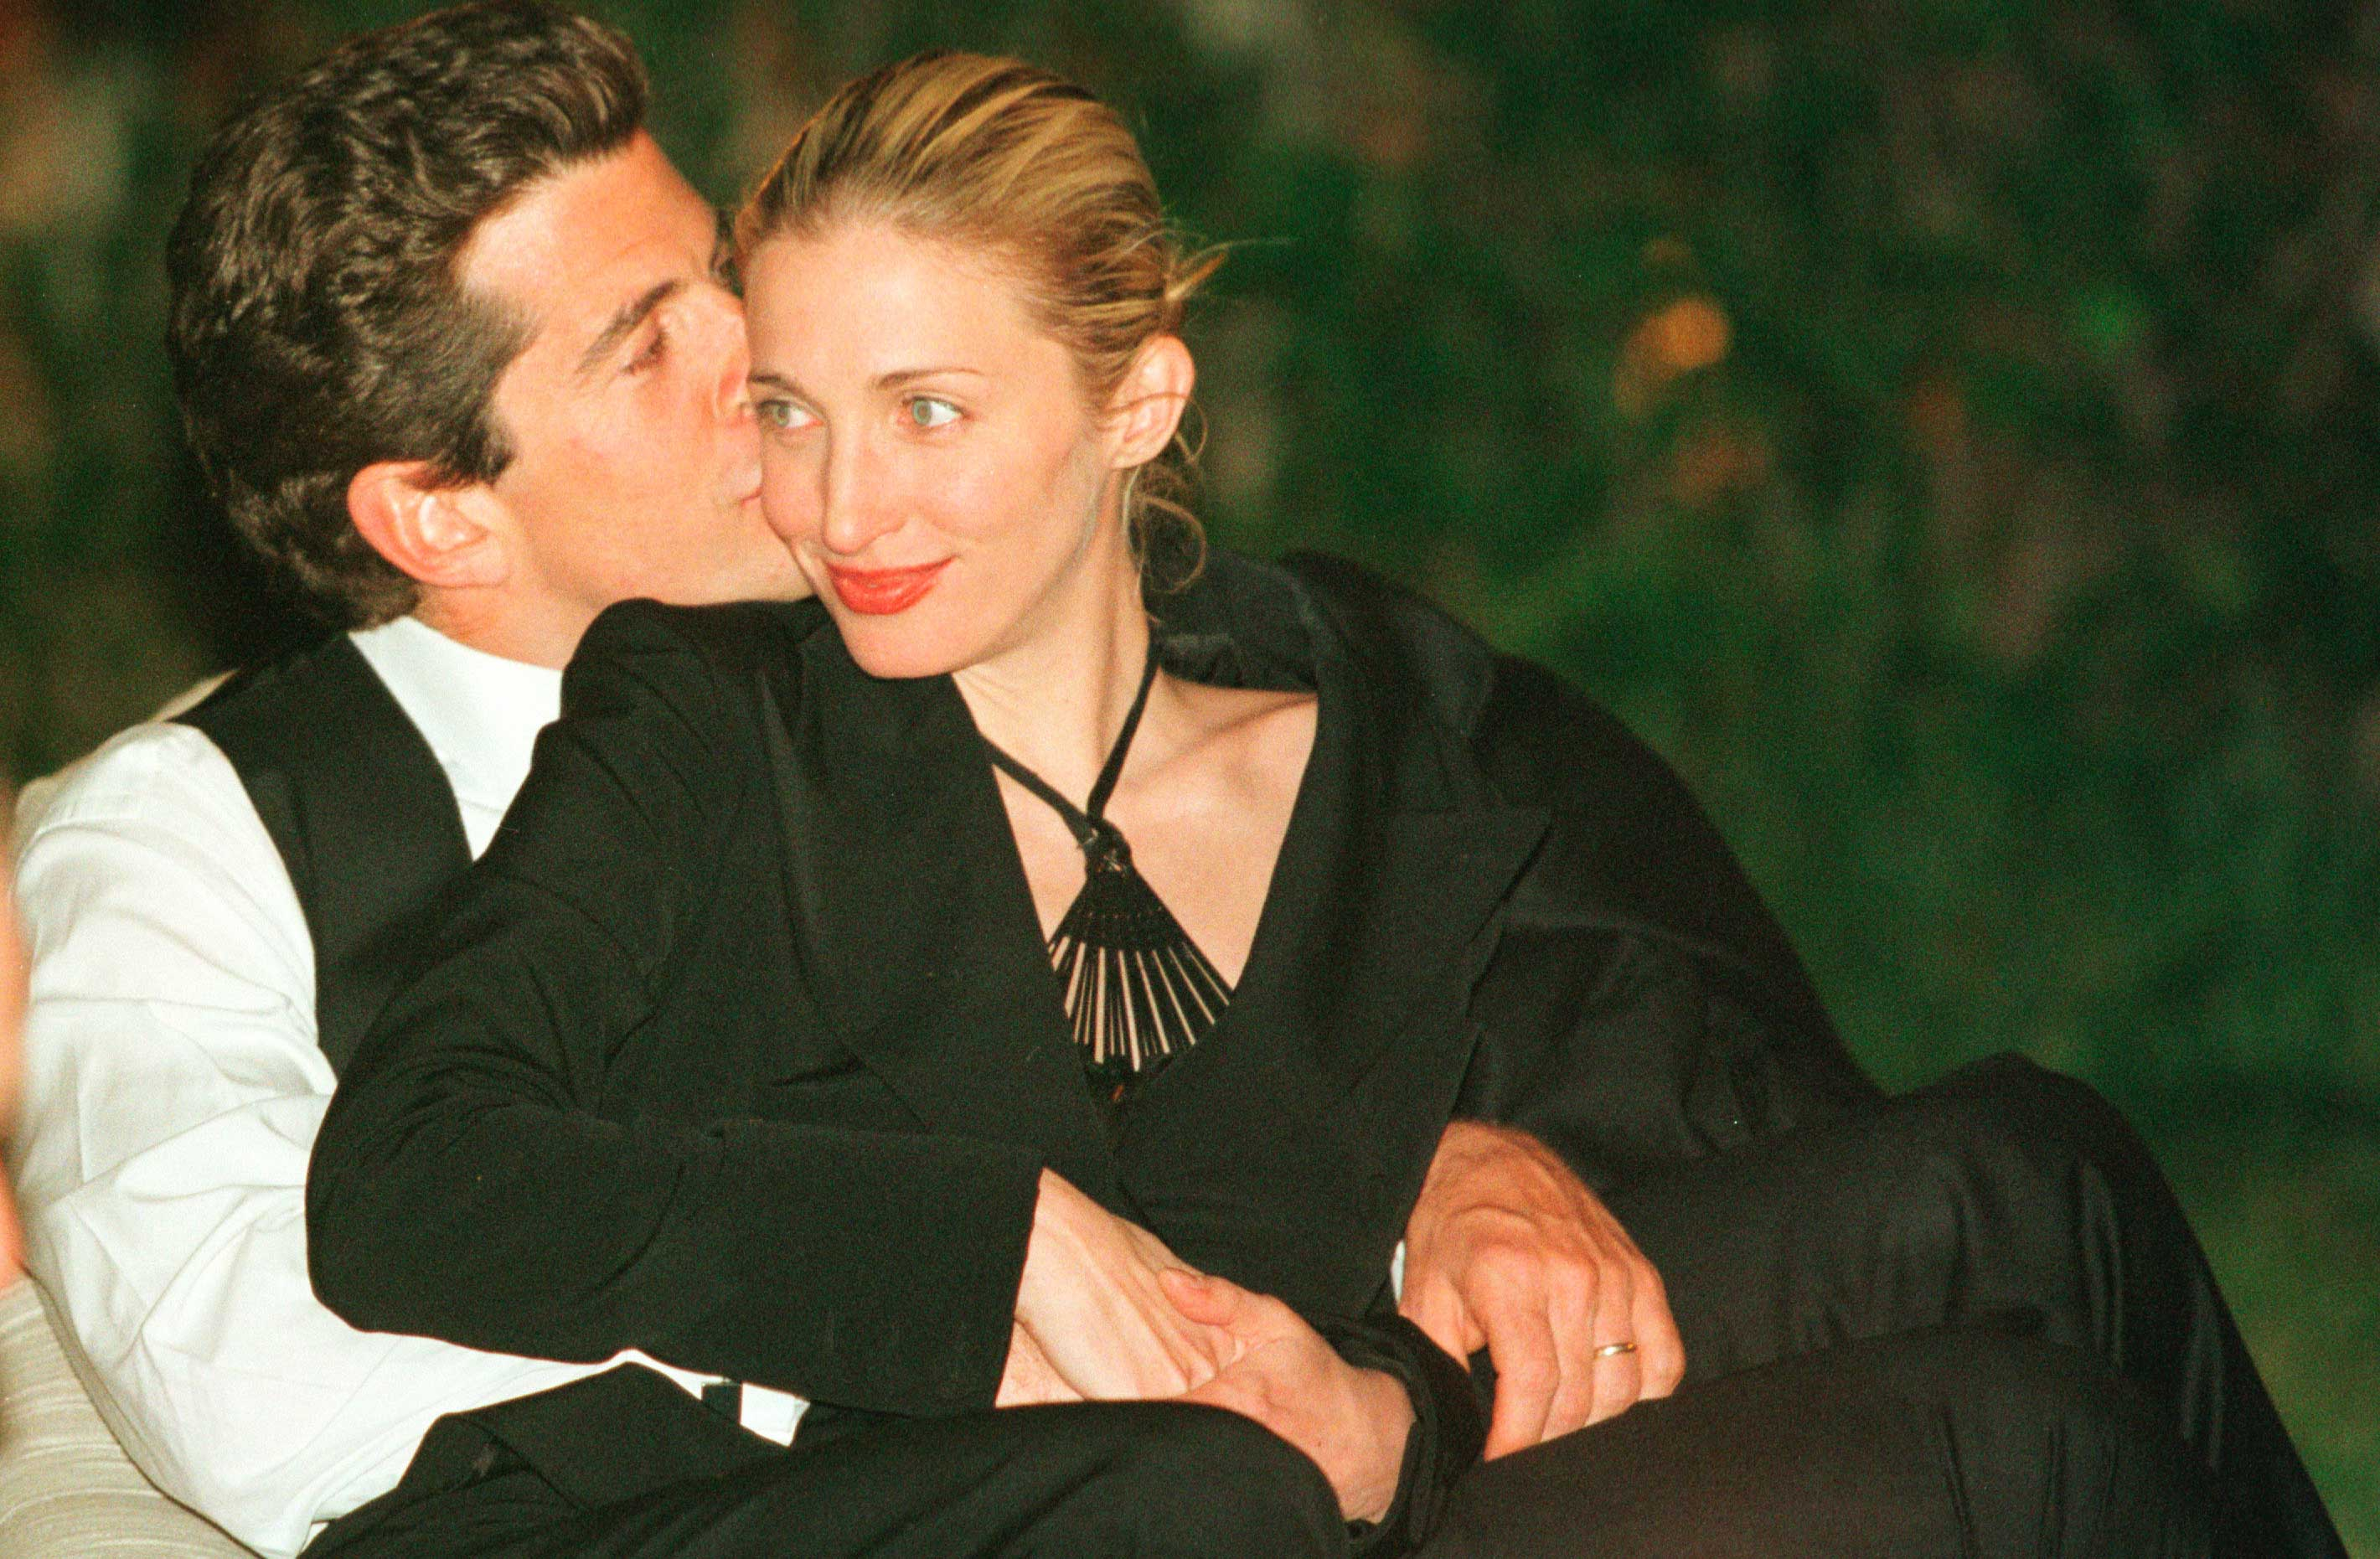 Nineties Power Couple Jfk Jr And Carolyn Bessette In 1999